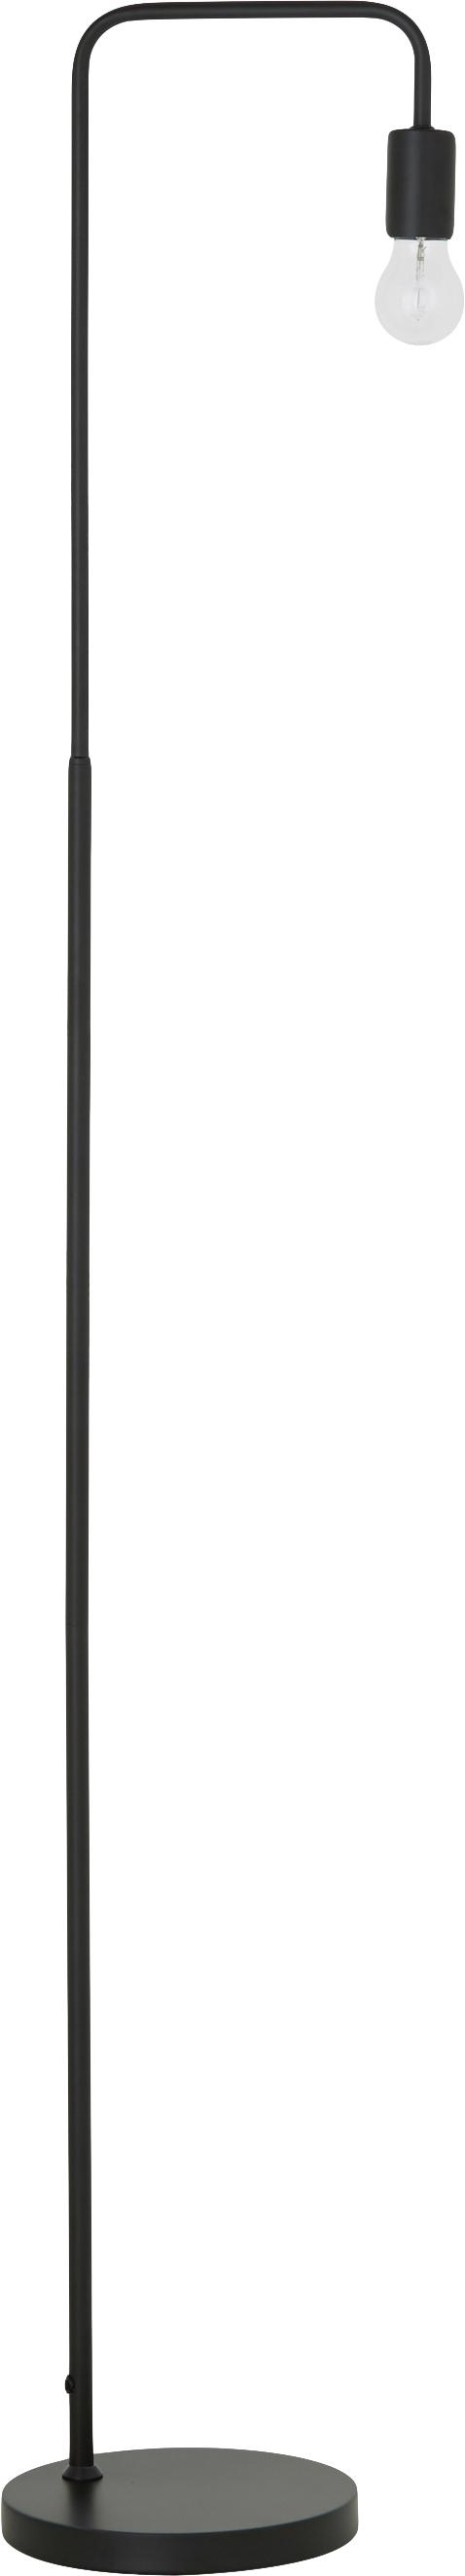 Vloerlamp Flow in zwart, Zwart, 33 x 153 cm